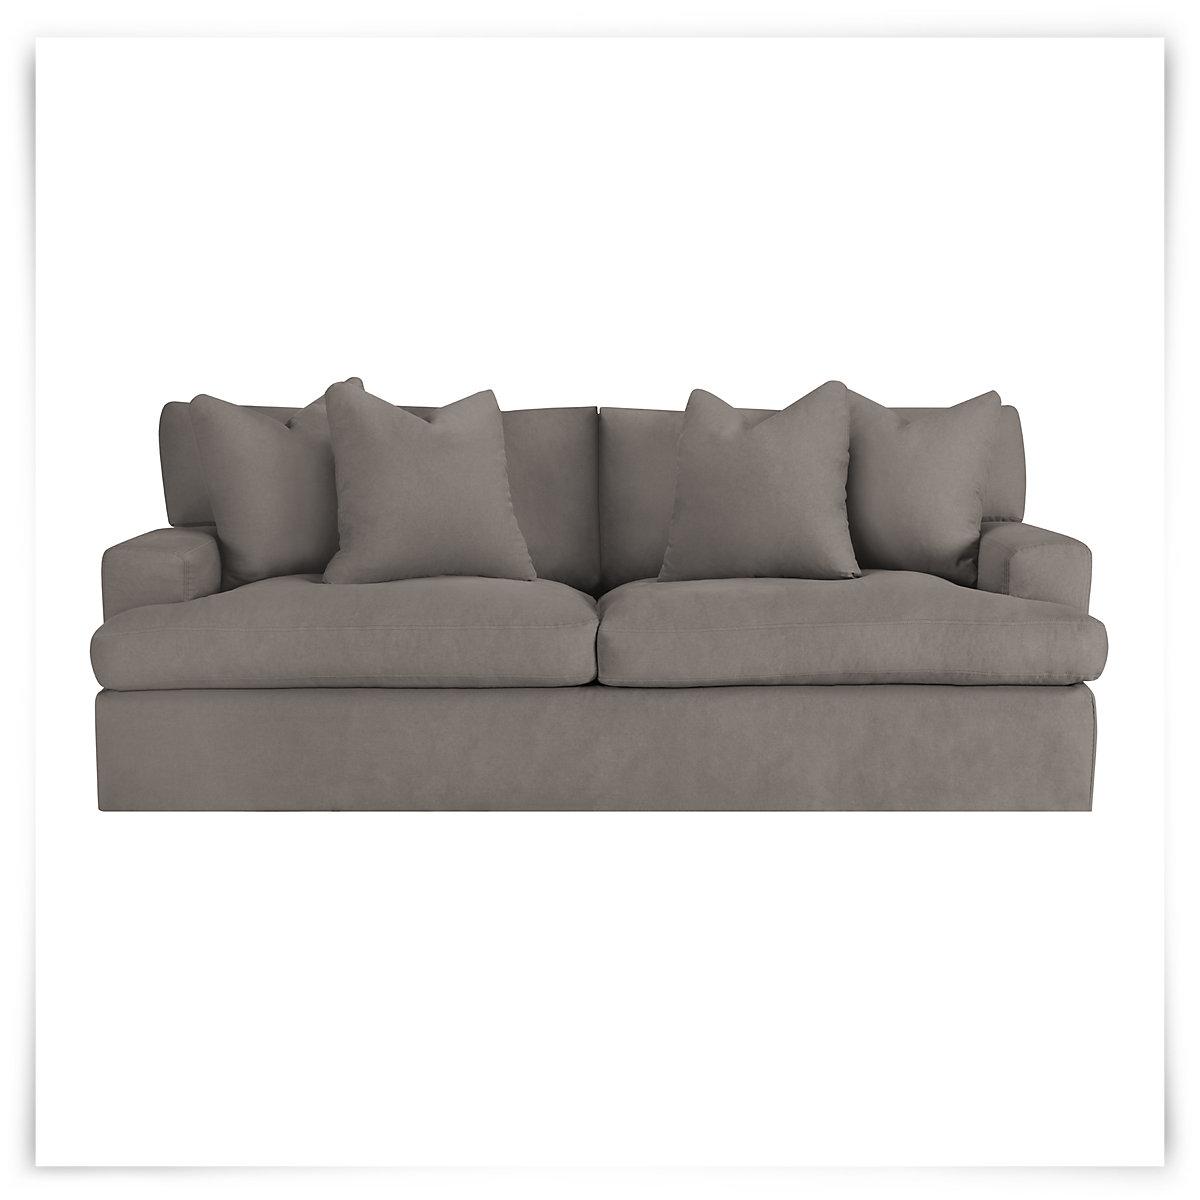 City Furniture Delilah Sofa